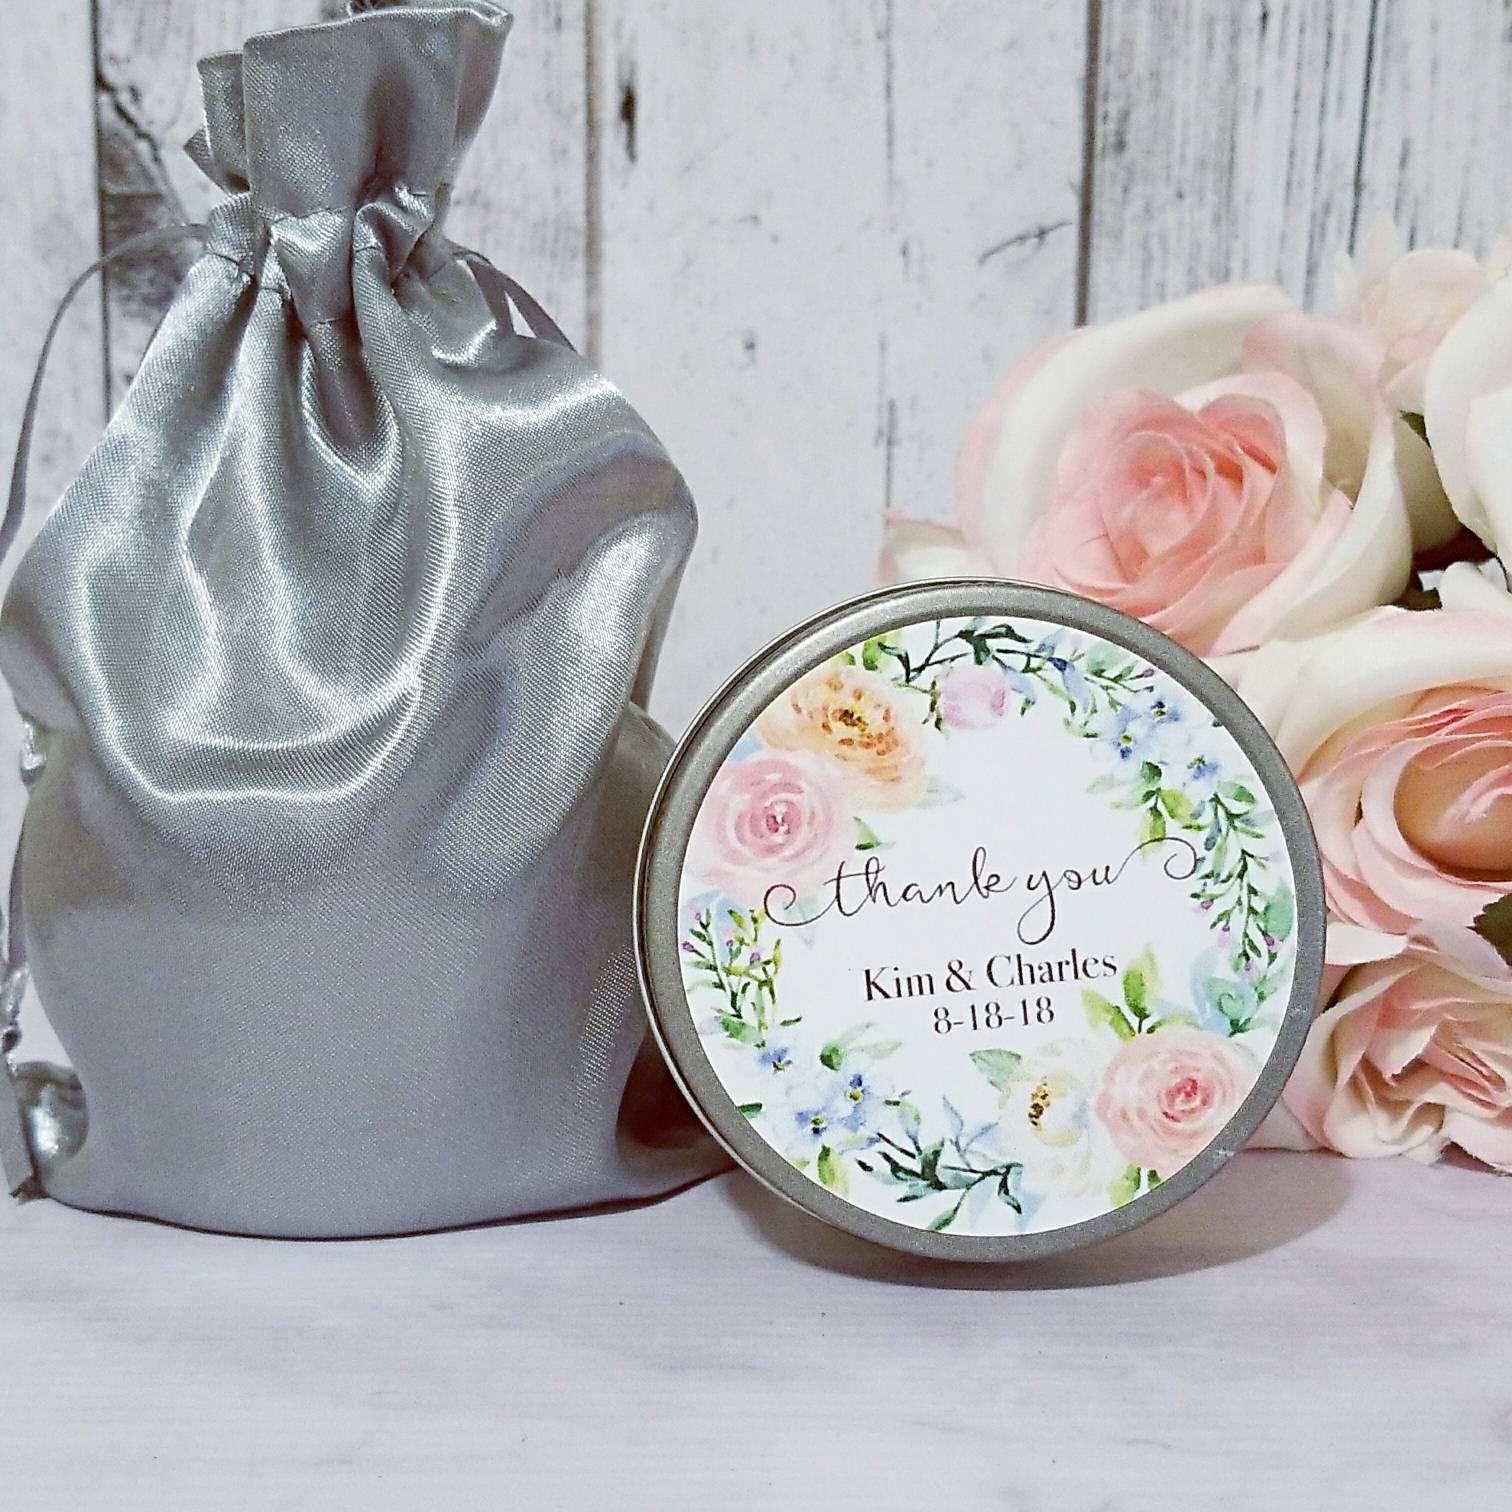 Greenery Wedding Favors - Wedding Soy Candles Favor - Wedding Candle ...